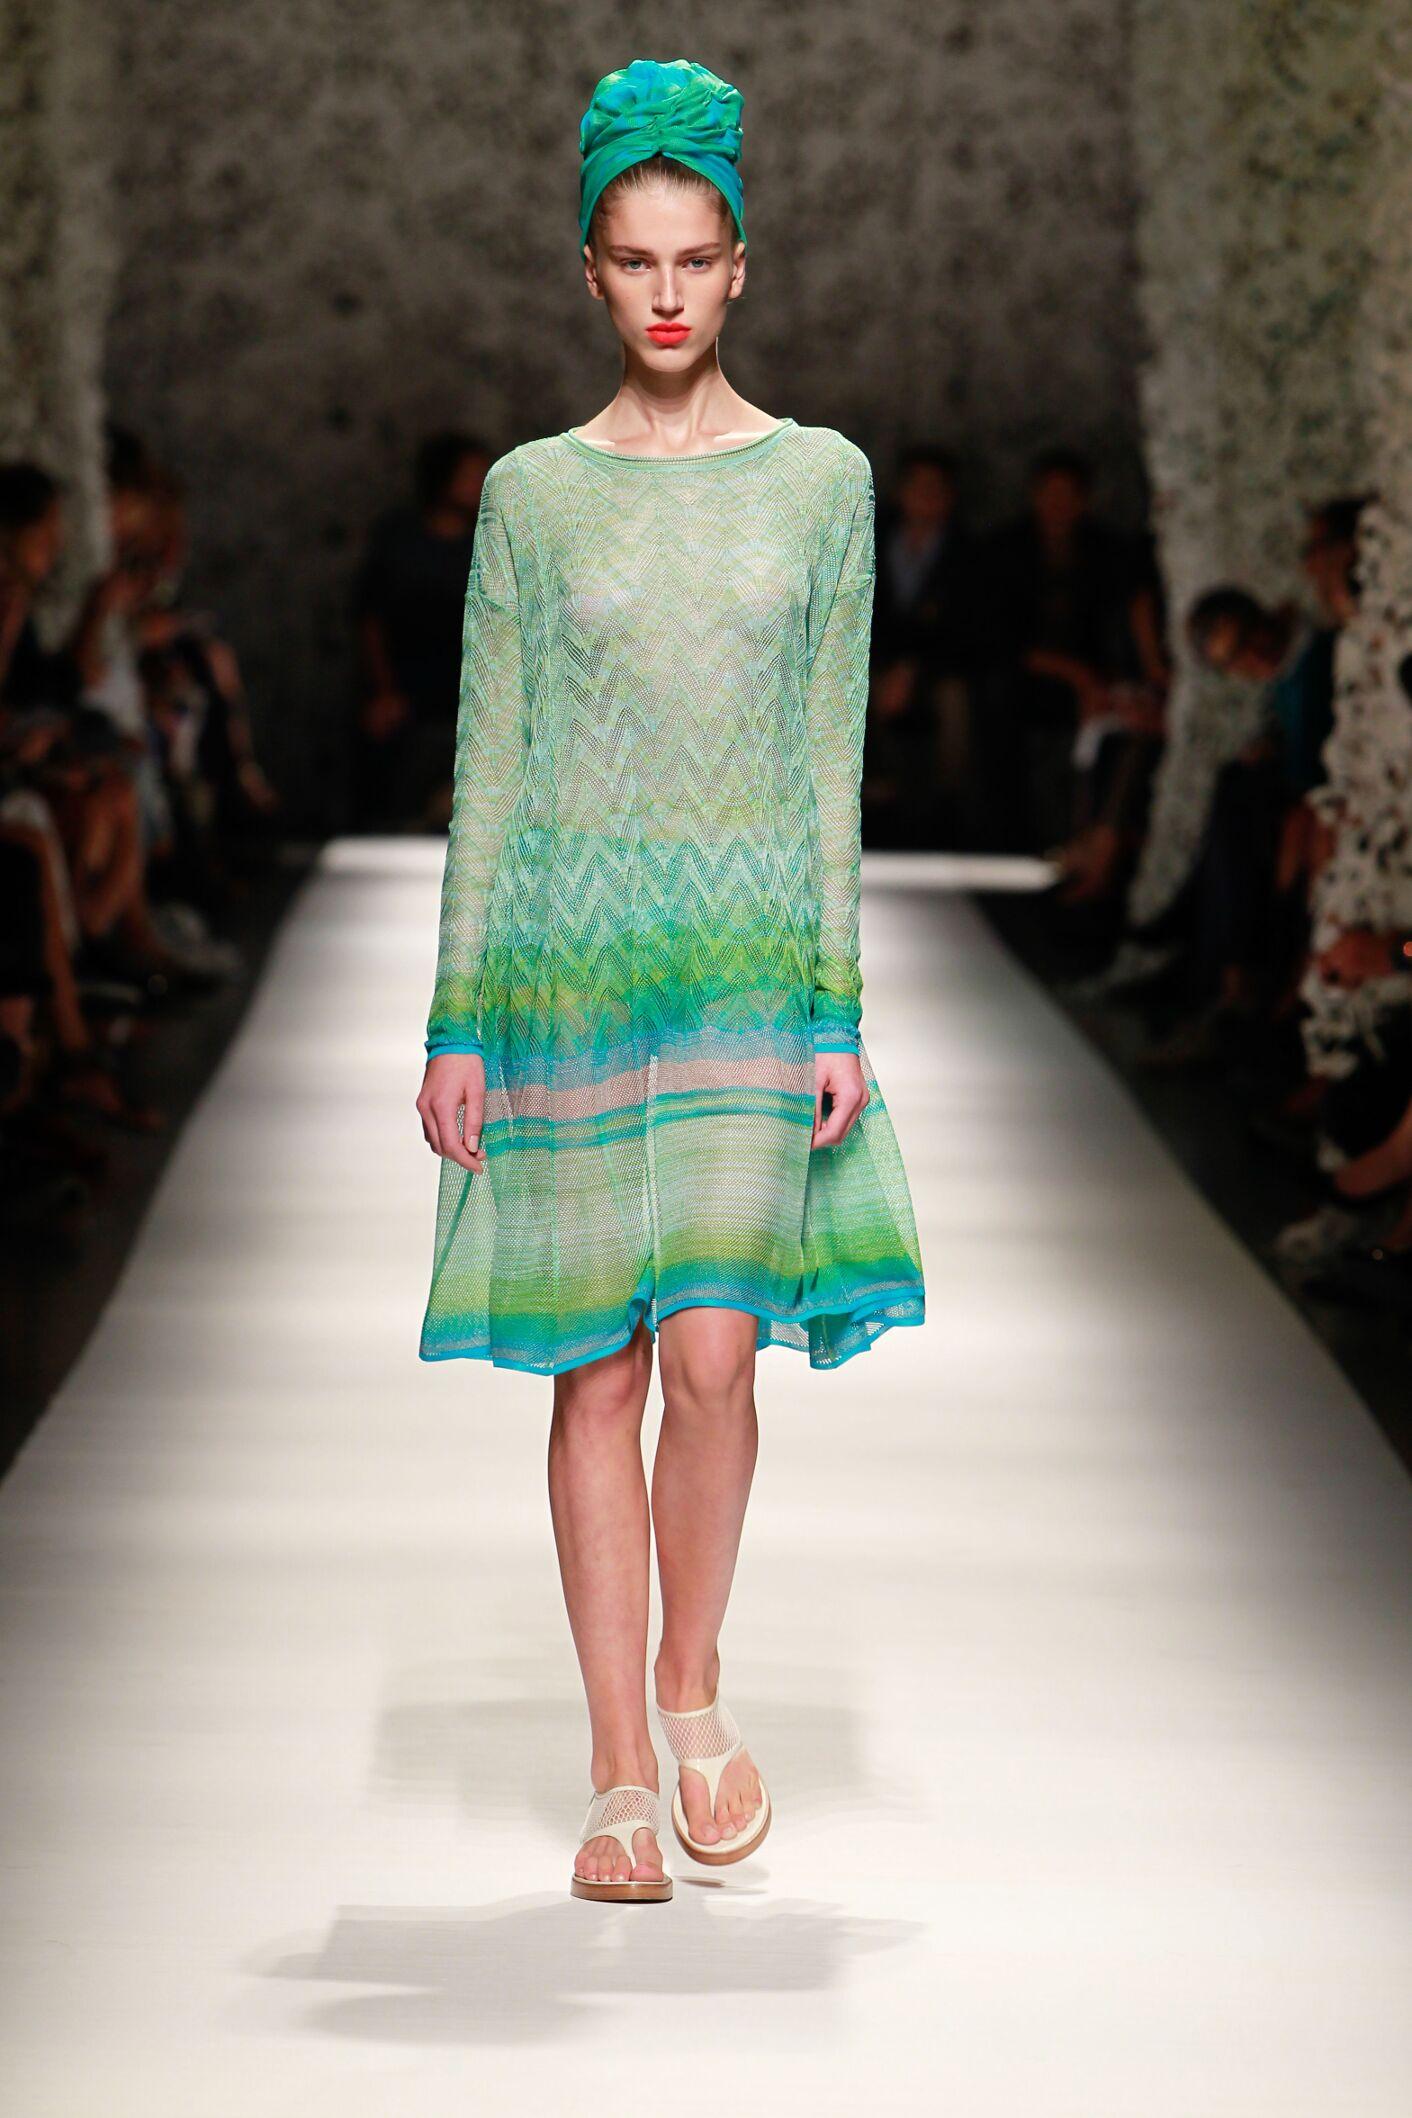 Fashion Model Missoni Catwalk